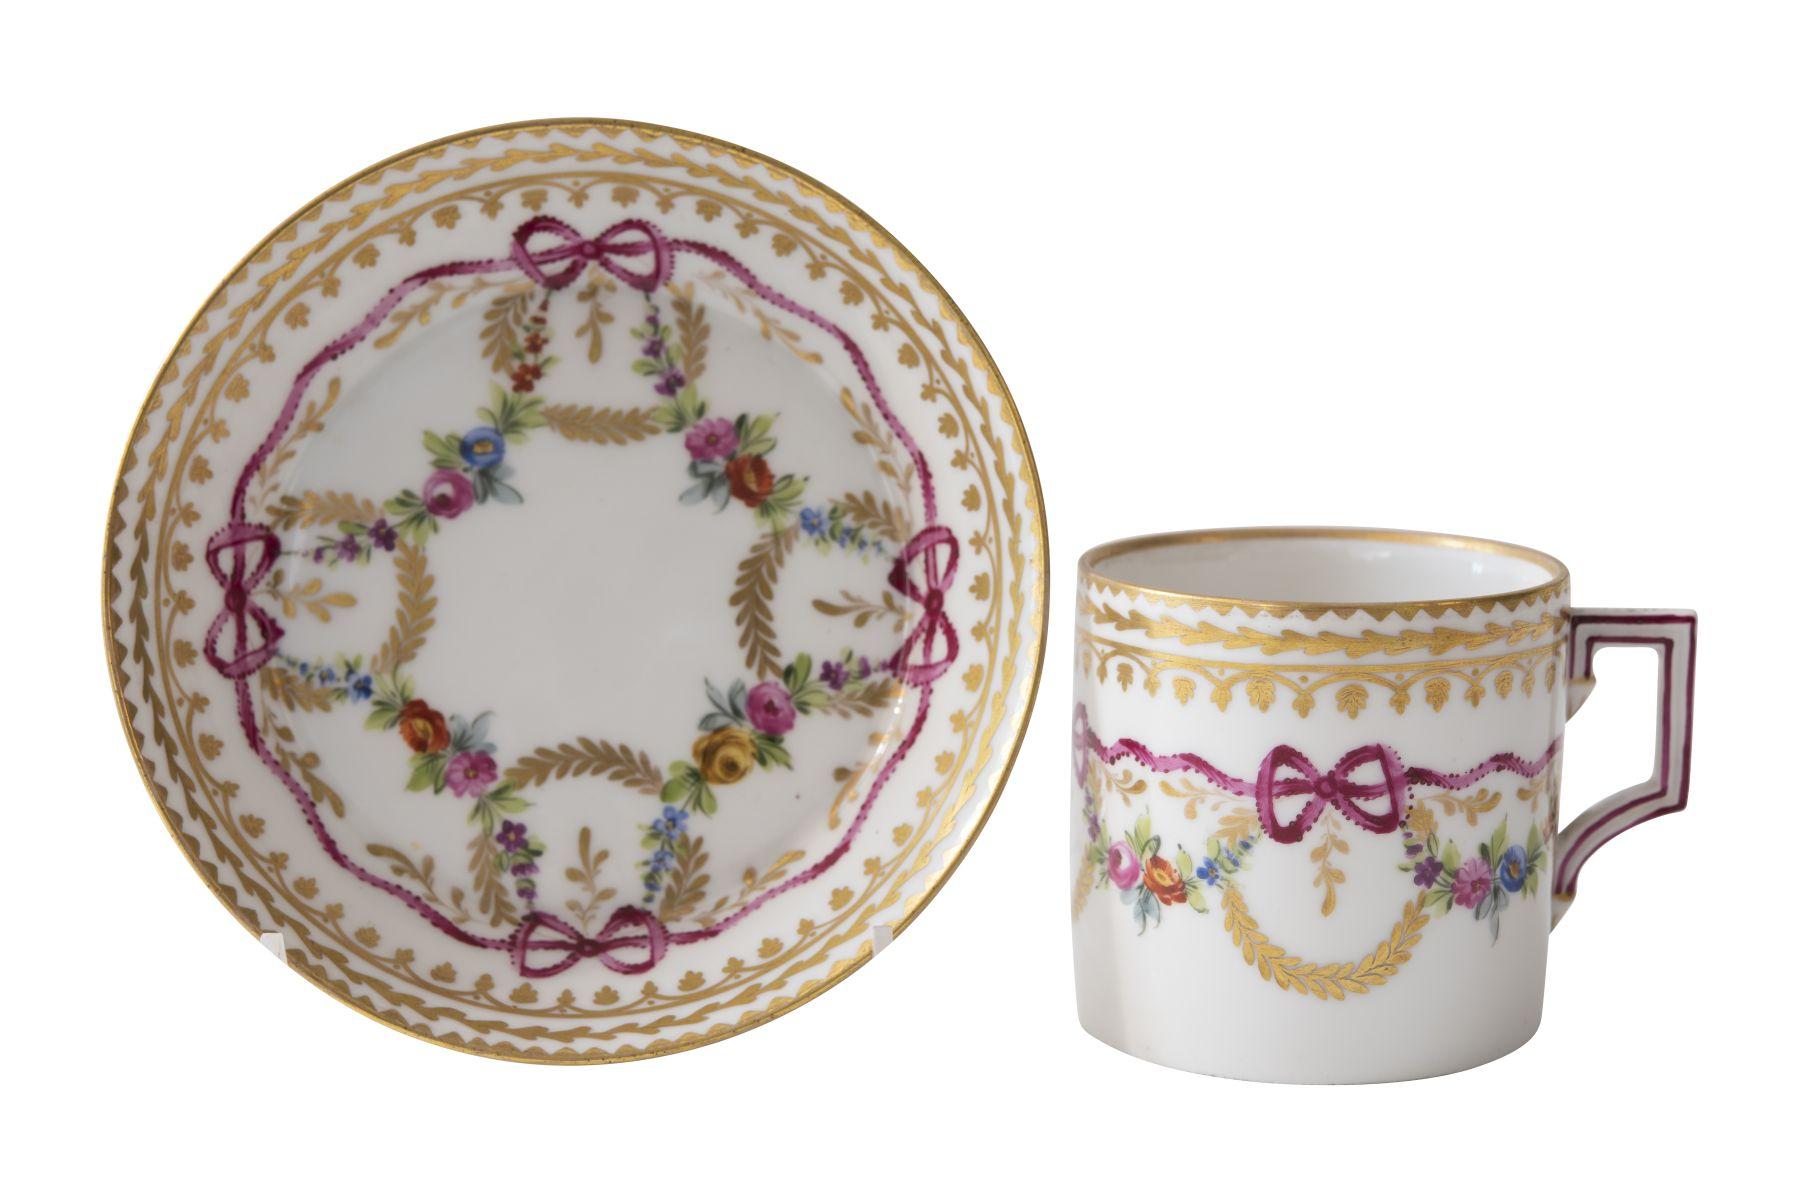 #137 Coffee cup with saucer, Augarten probably end of 18th century   Kaffeetasse mit Unterschale, Augarten Ende 18. Jh Image